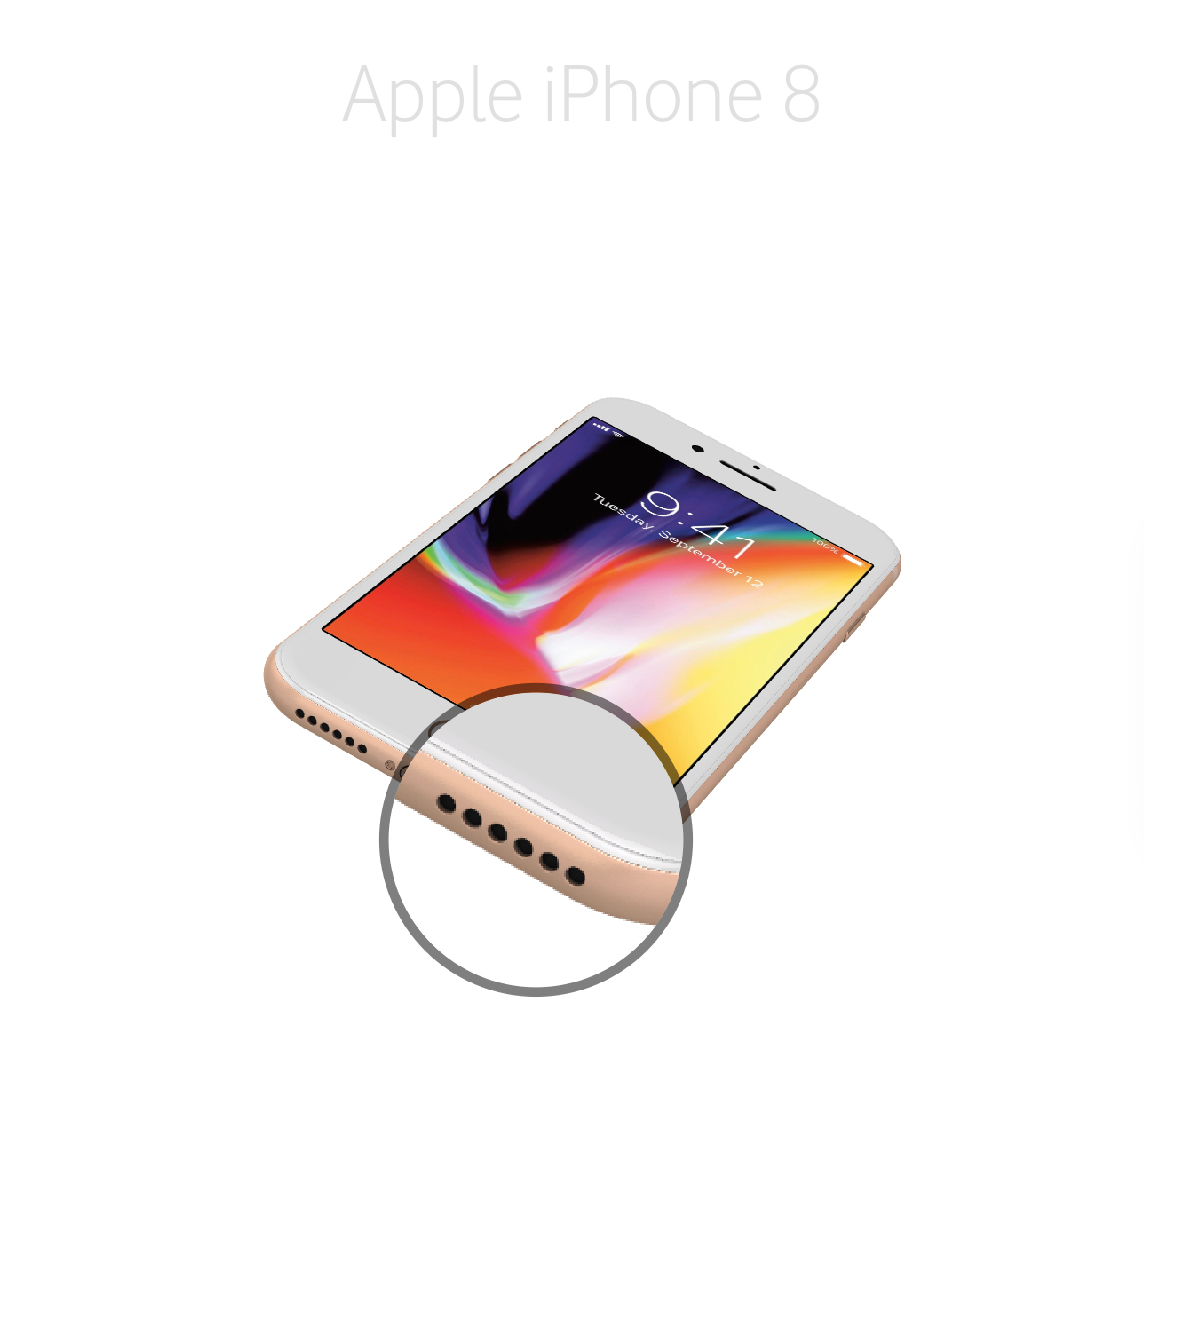 Laga högtalare iPhone 8